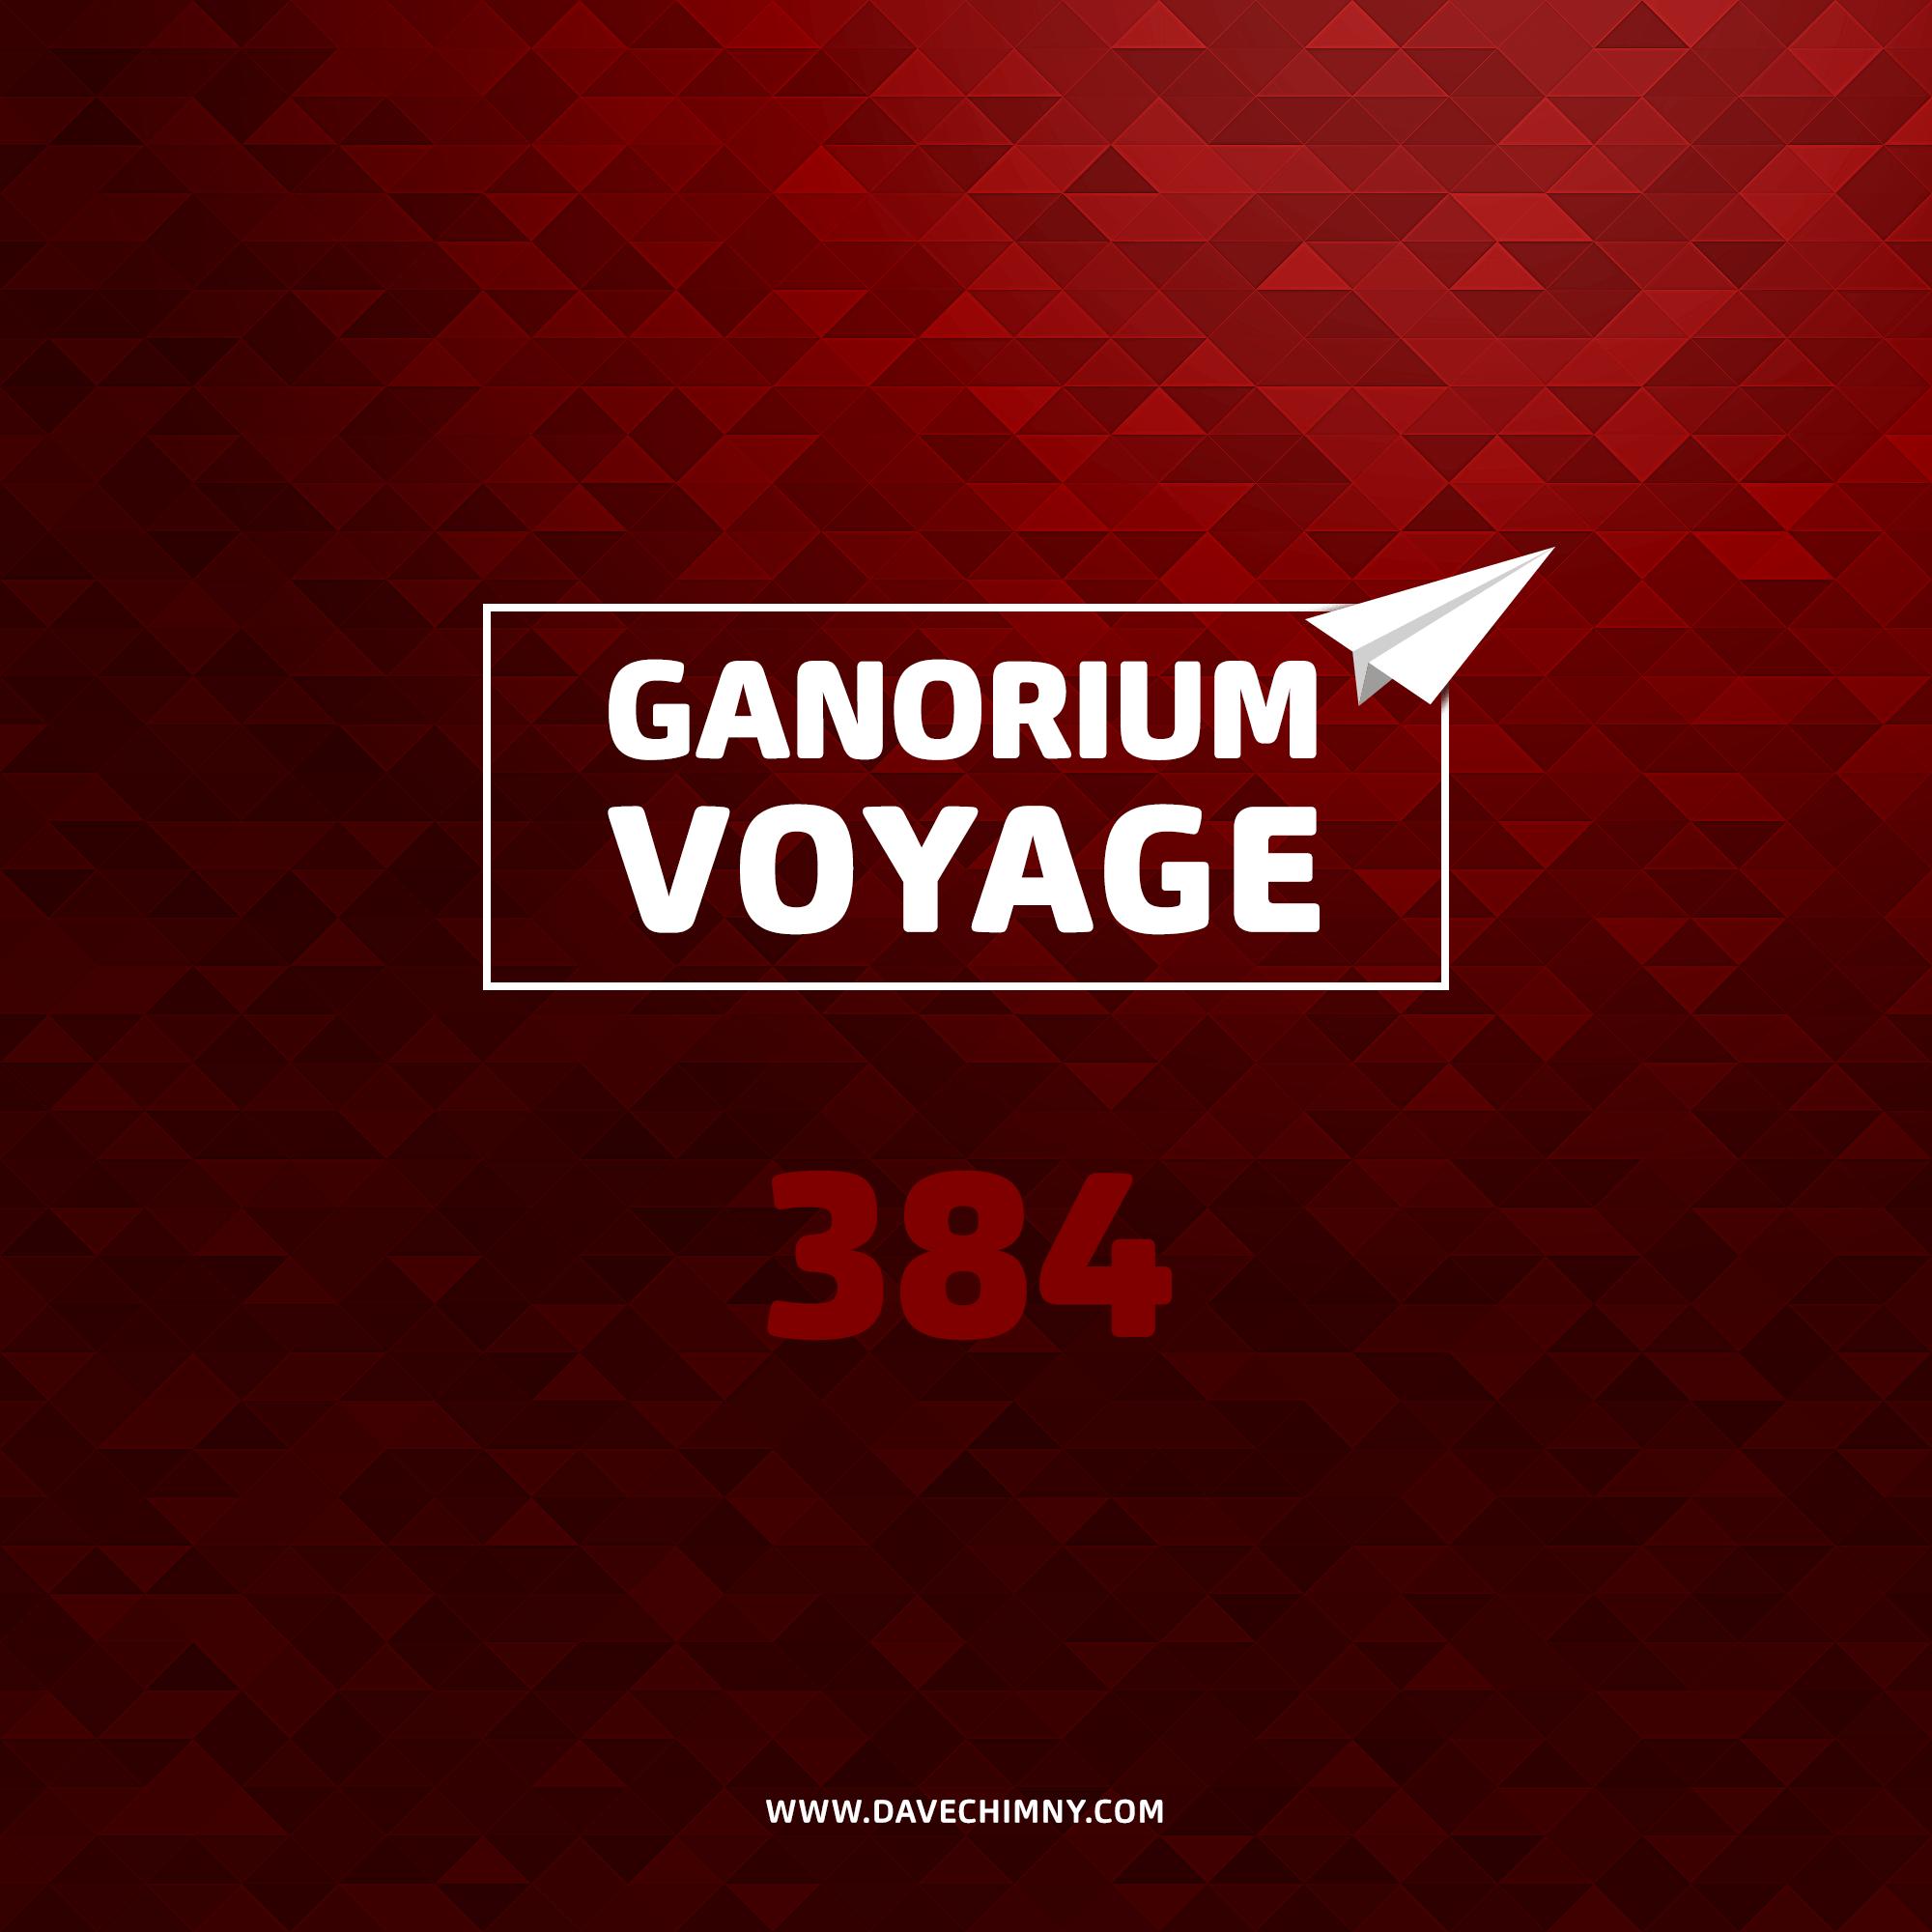 Dave Chimny – Ganorium Voyage 384